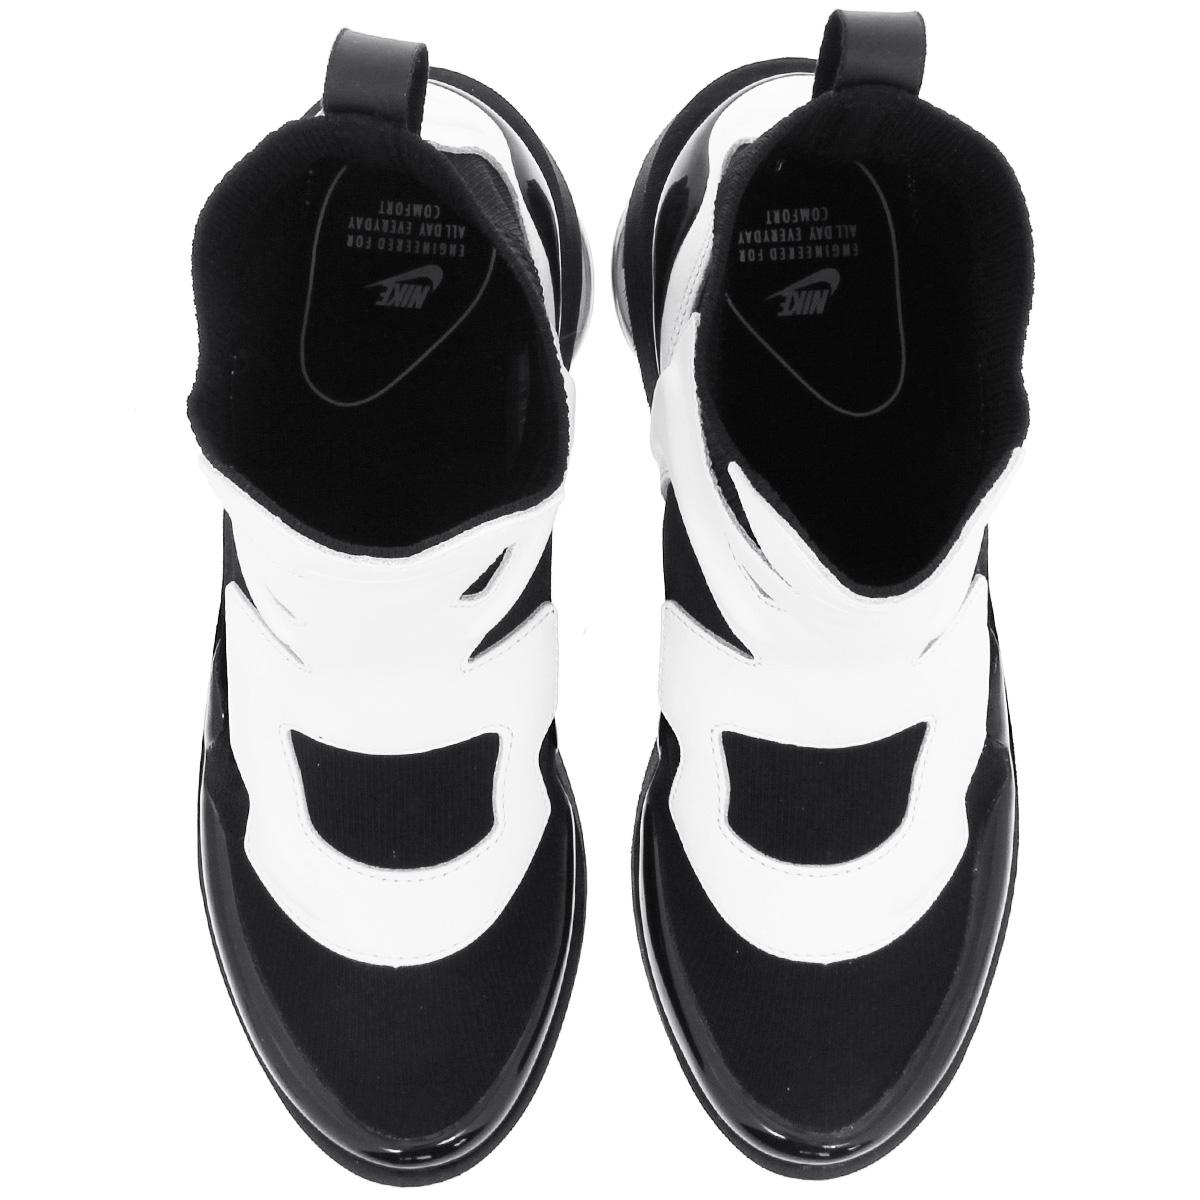 df0962b3ffe9 NIKE WMNS AIR VAPORMAX LIGHT II Nike women air vapor max light 2 BLACK WHITE  ANTHRACITE ao4537-002